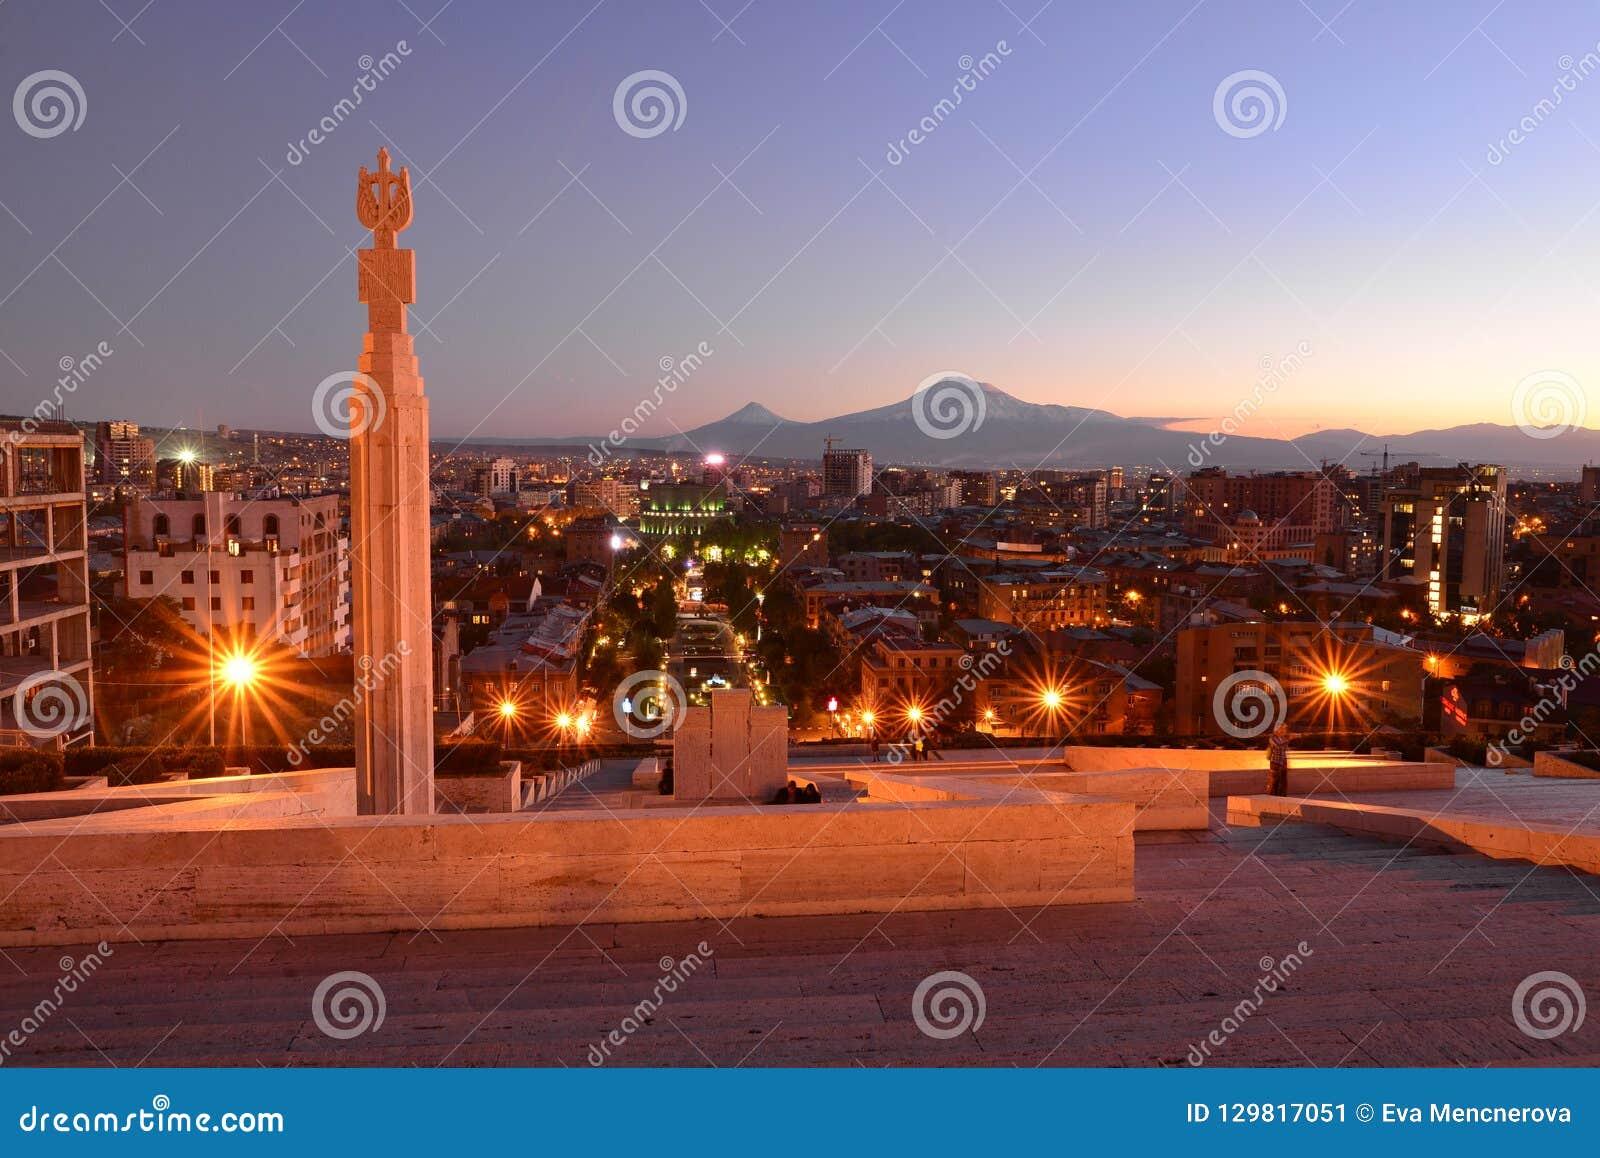 Yerevan at night with Mt. Ararat